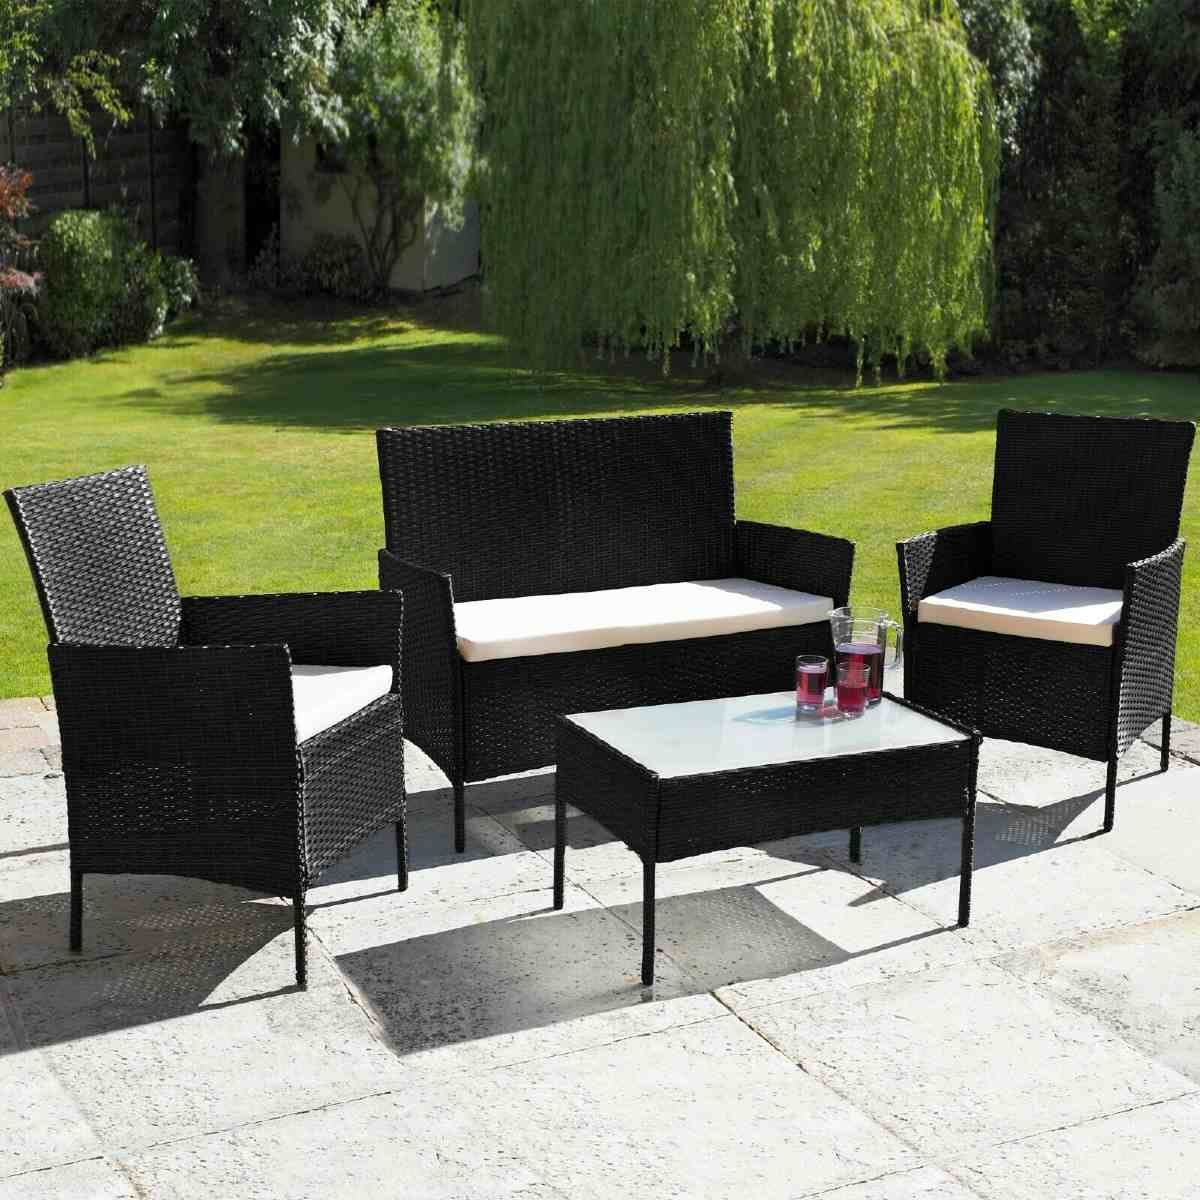 Neo Direct 4 Piece Rattan Outdoor Garden Sofa Set - Black